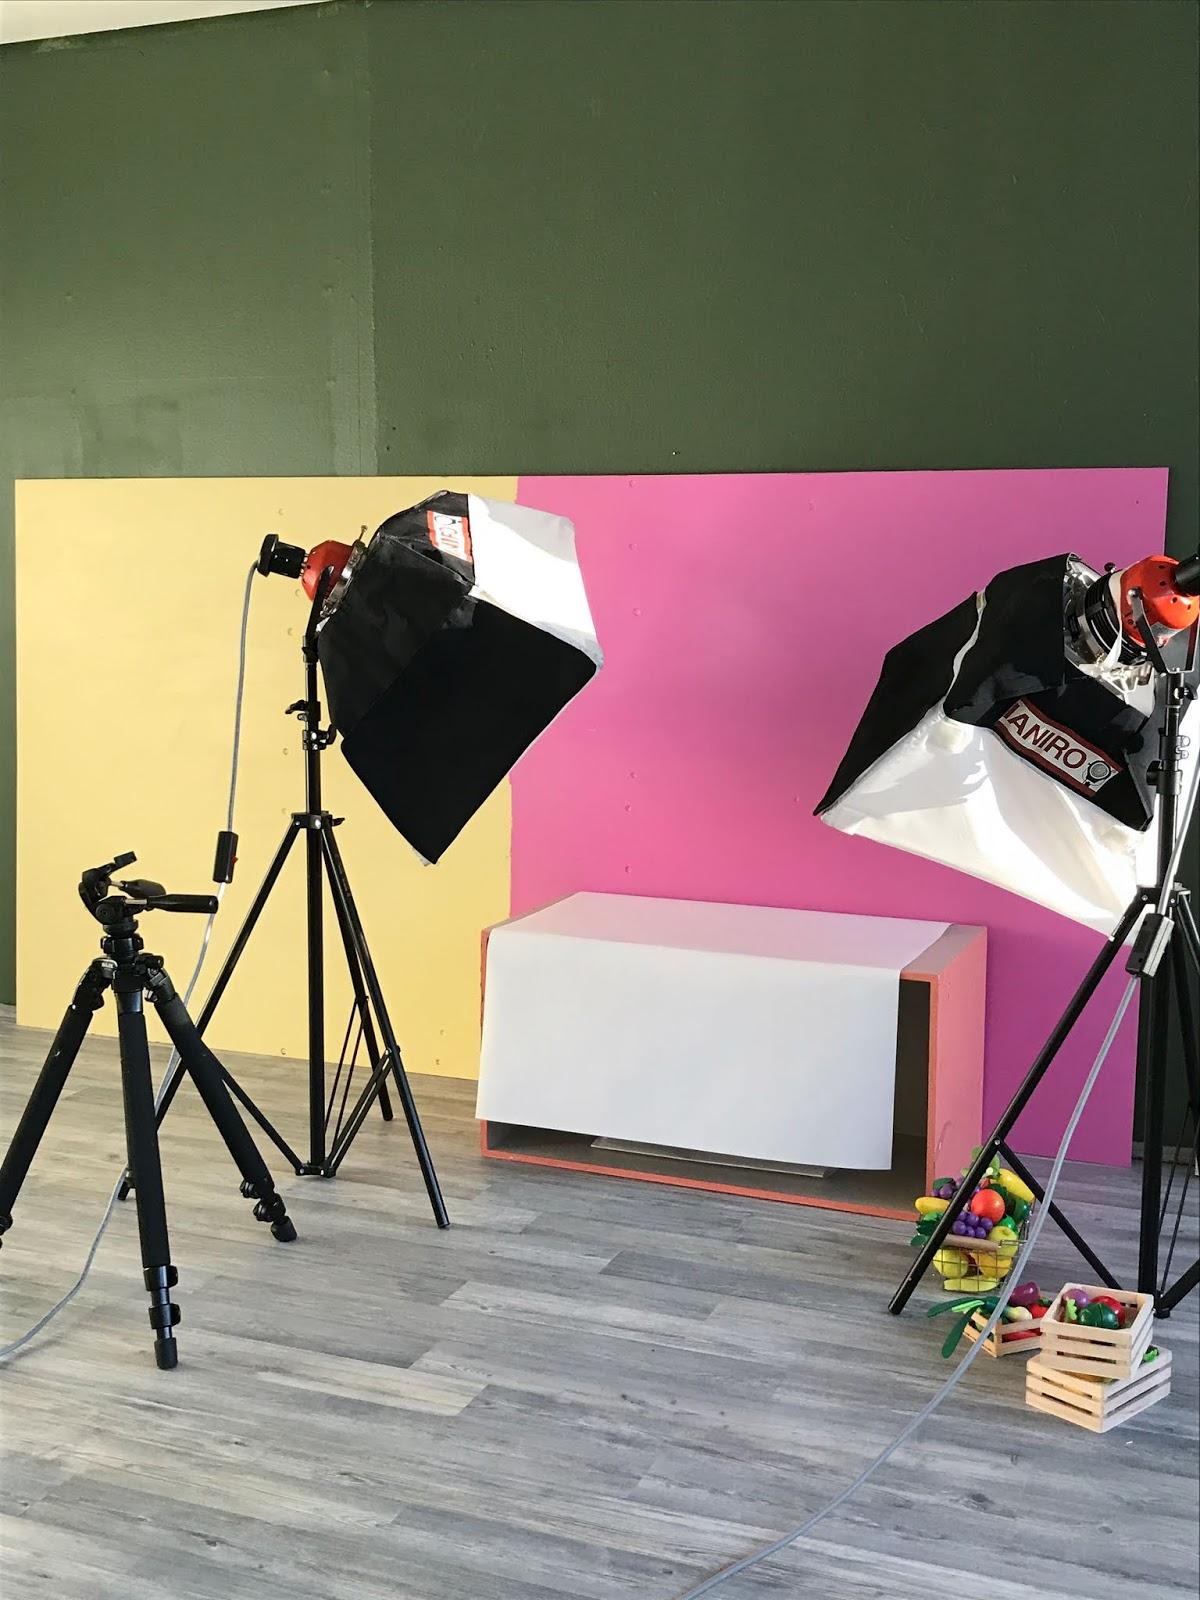 Kuvauksen setup